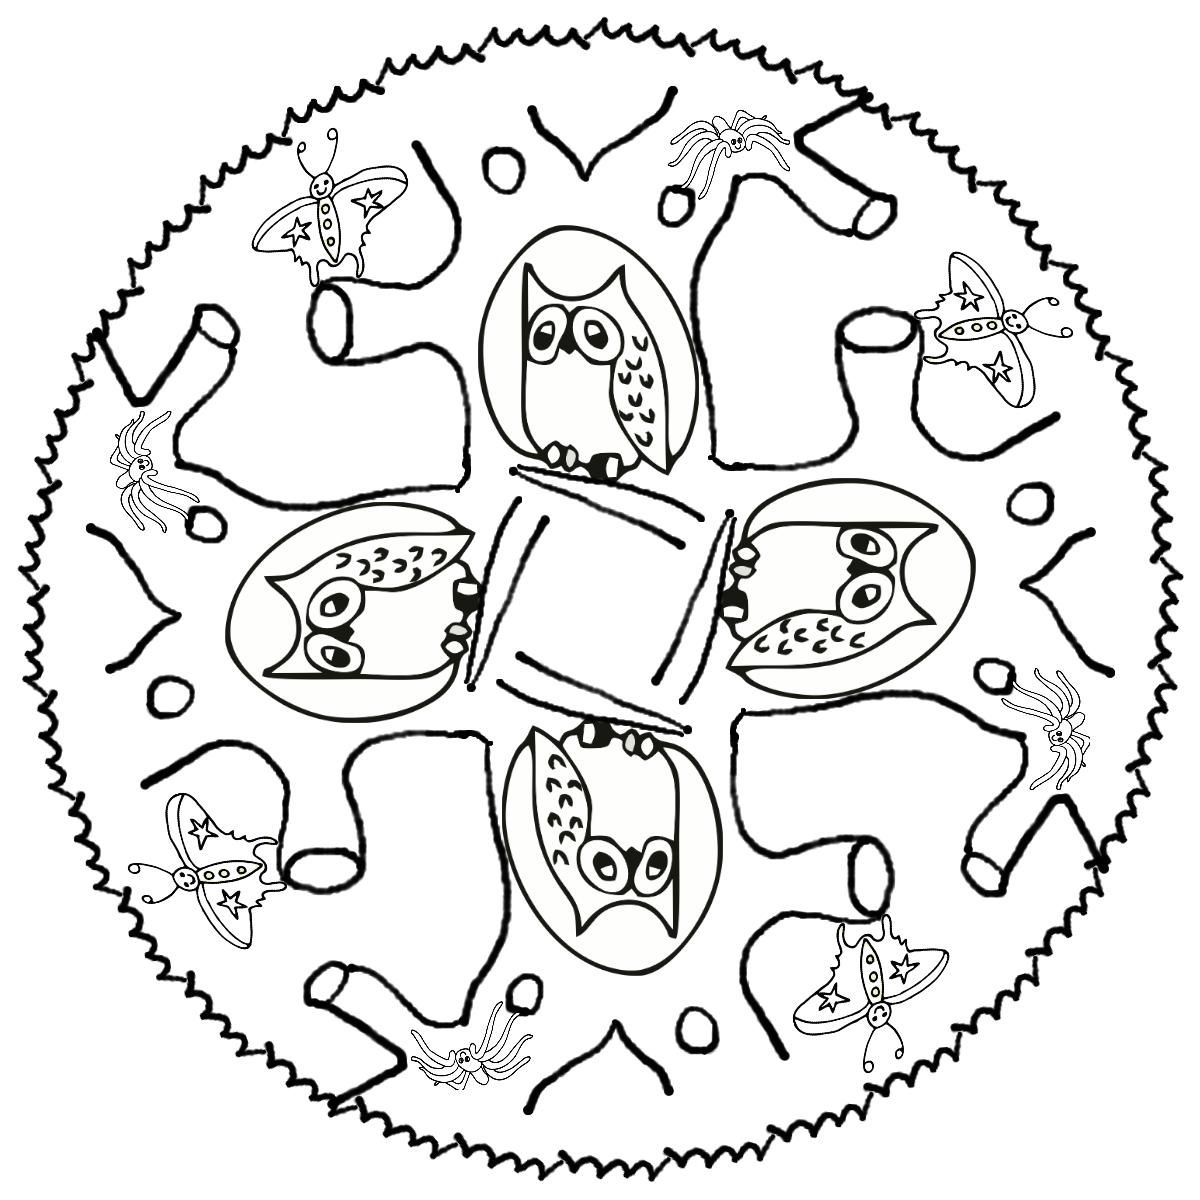 Eulen Mandala Tiere 1118 Malvorlage Eule Ausmalbilder Kostenlos ...